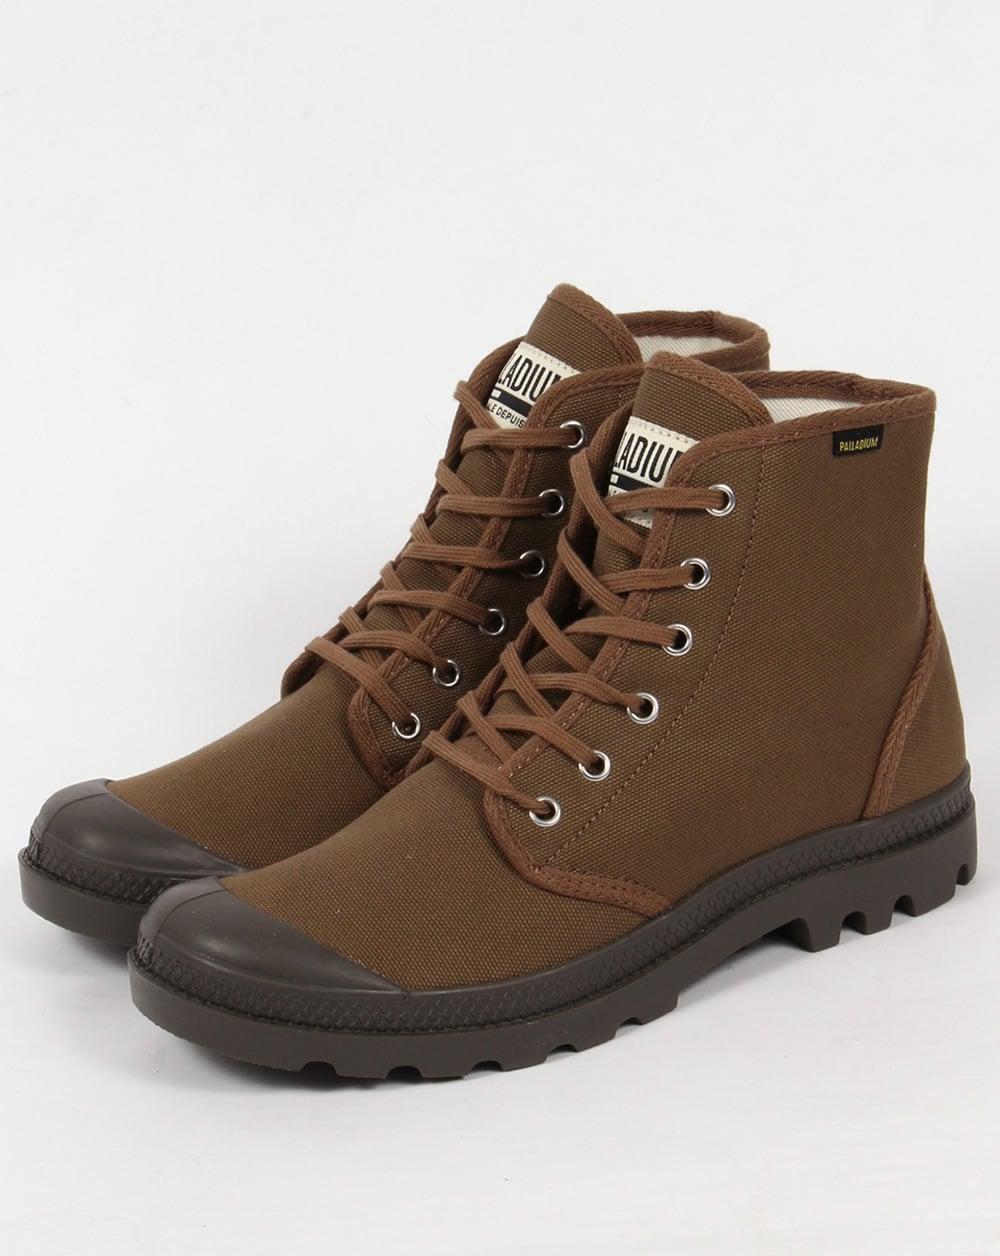 be5194ade33 Palladium Pampa Hi Originale Boots Butternut/Tarm